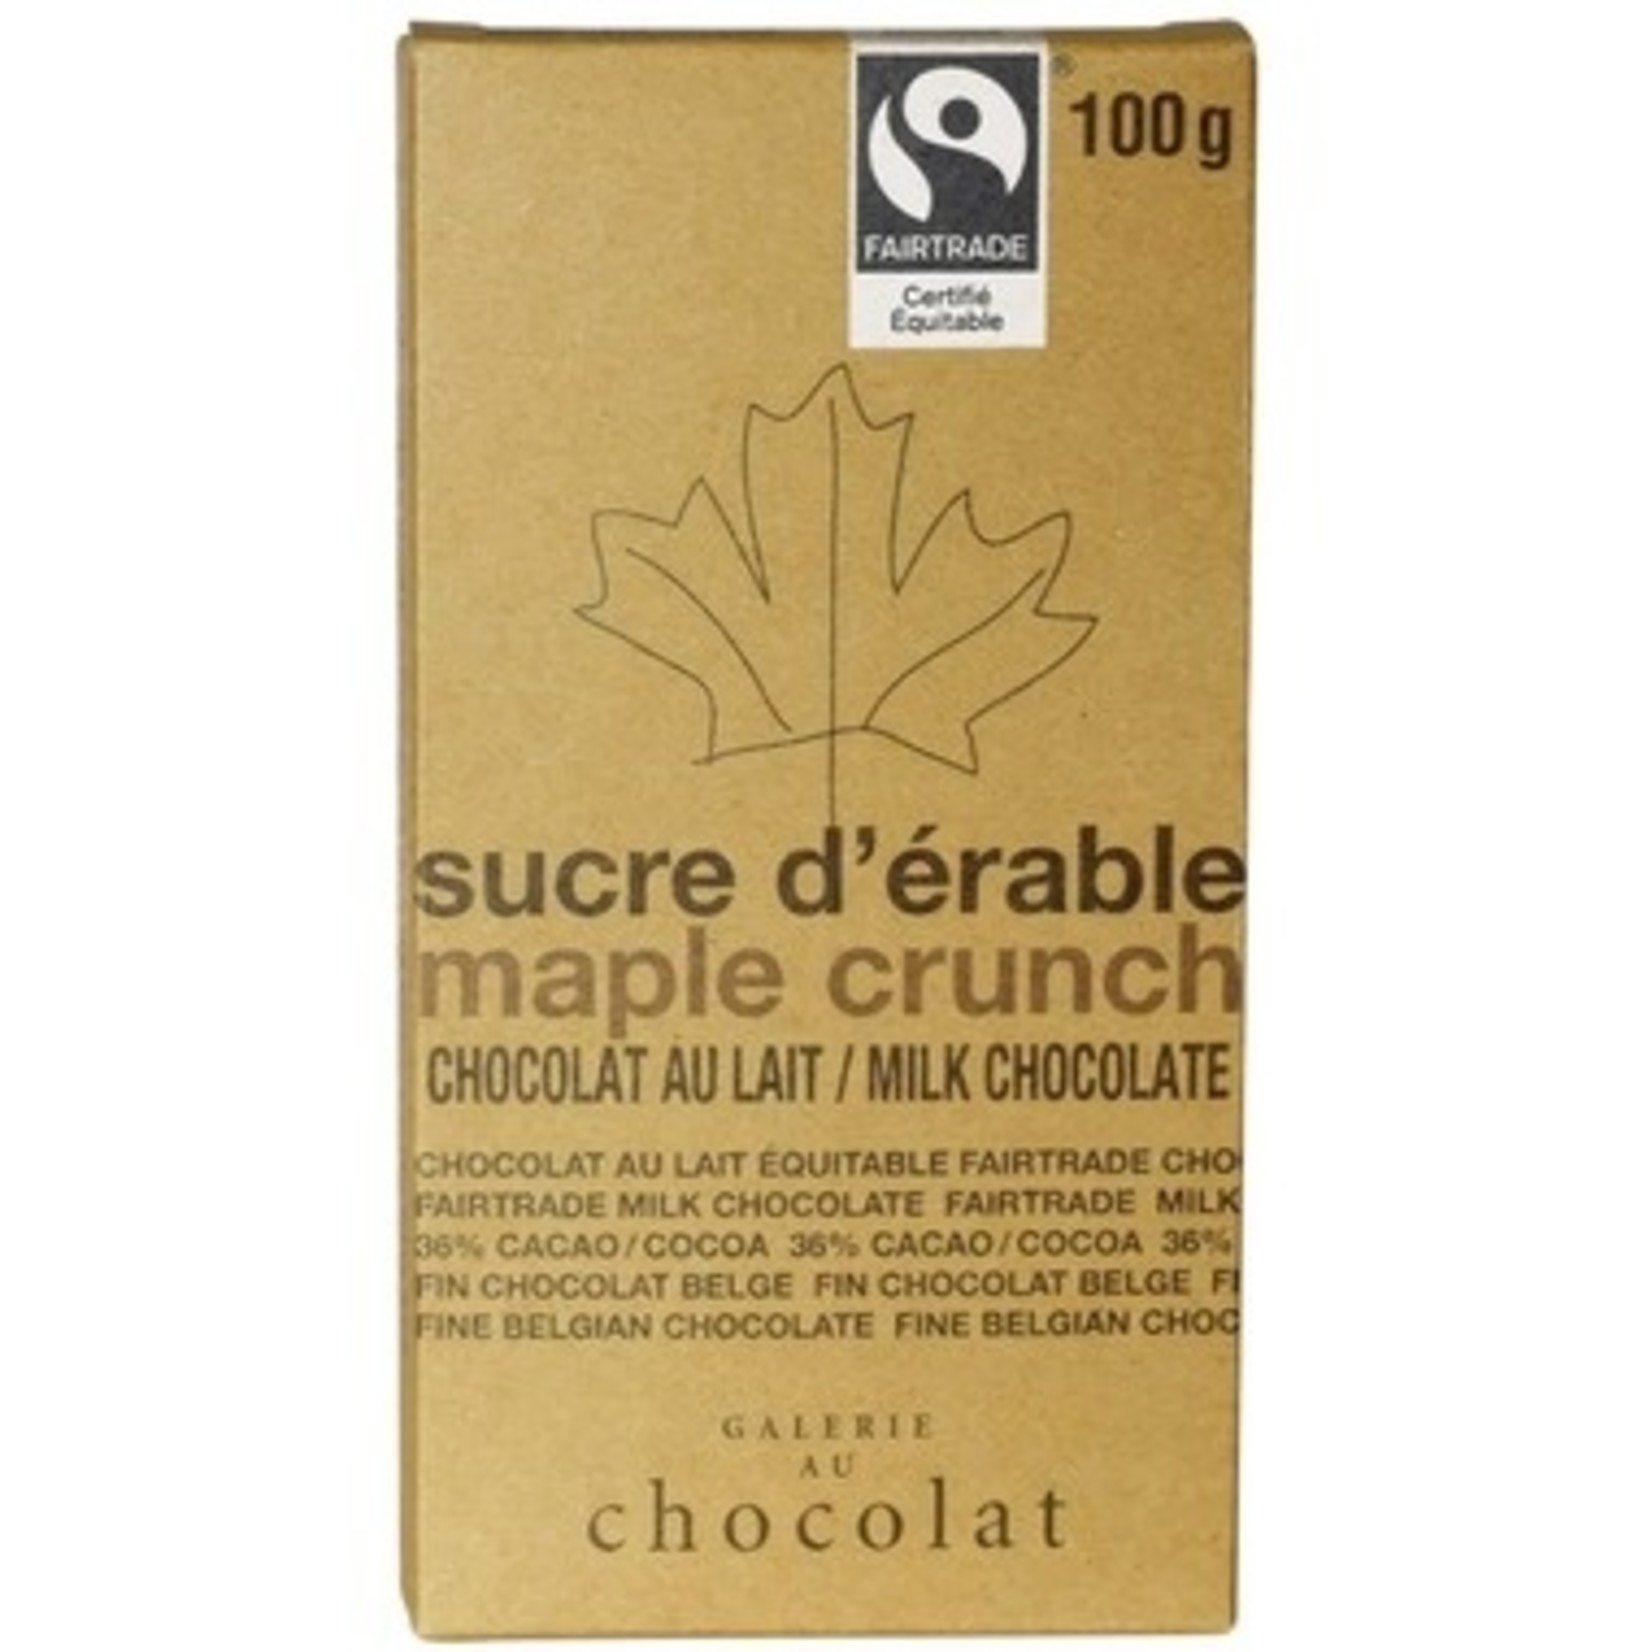 Galerie Au Chocolat Galerie Au Chocolat Maple Crunch 100g